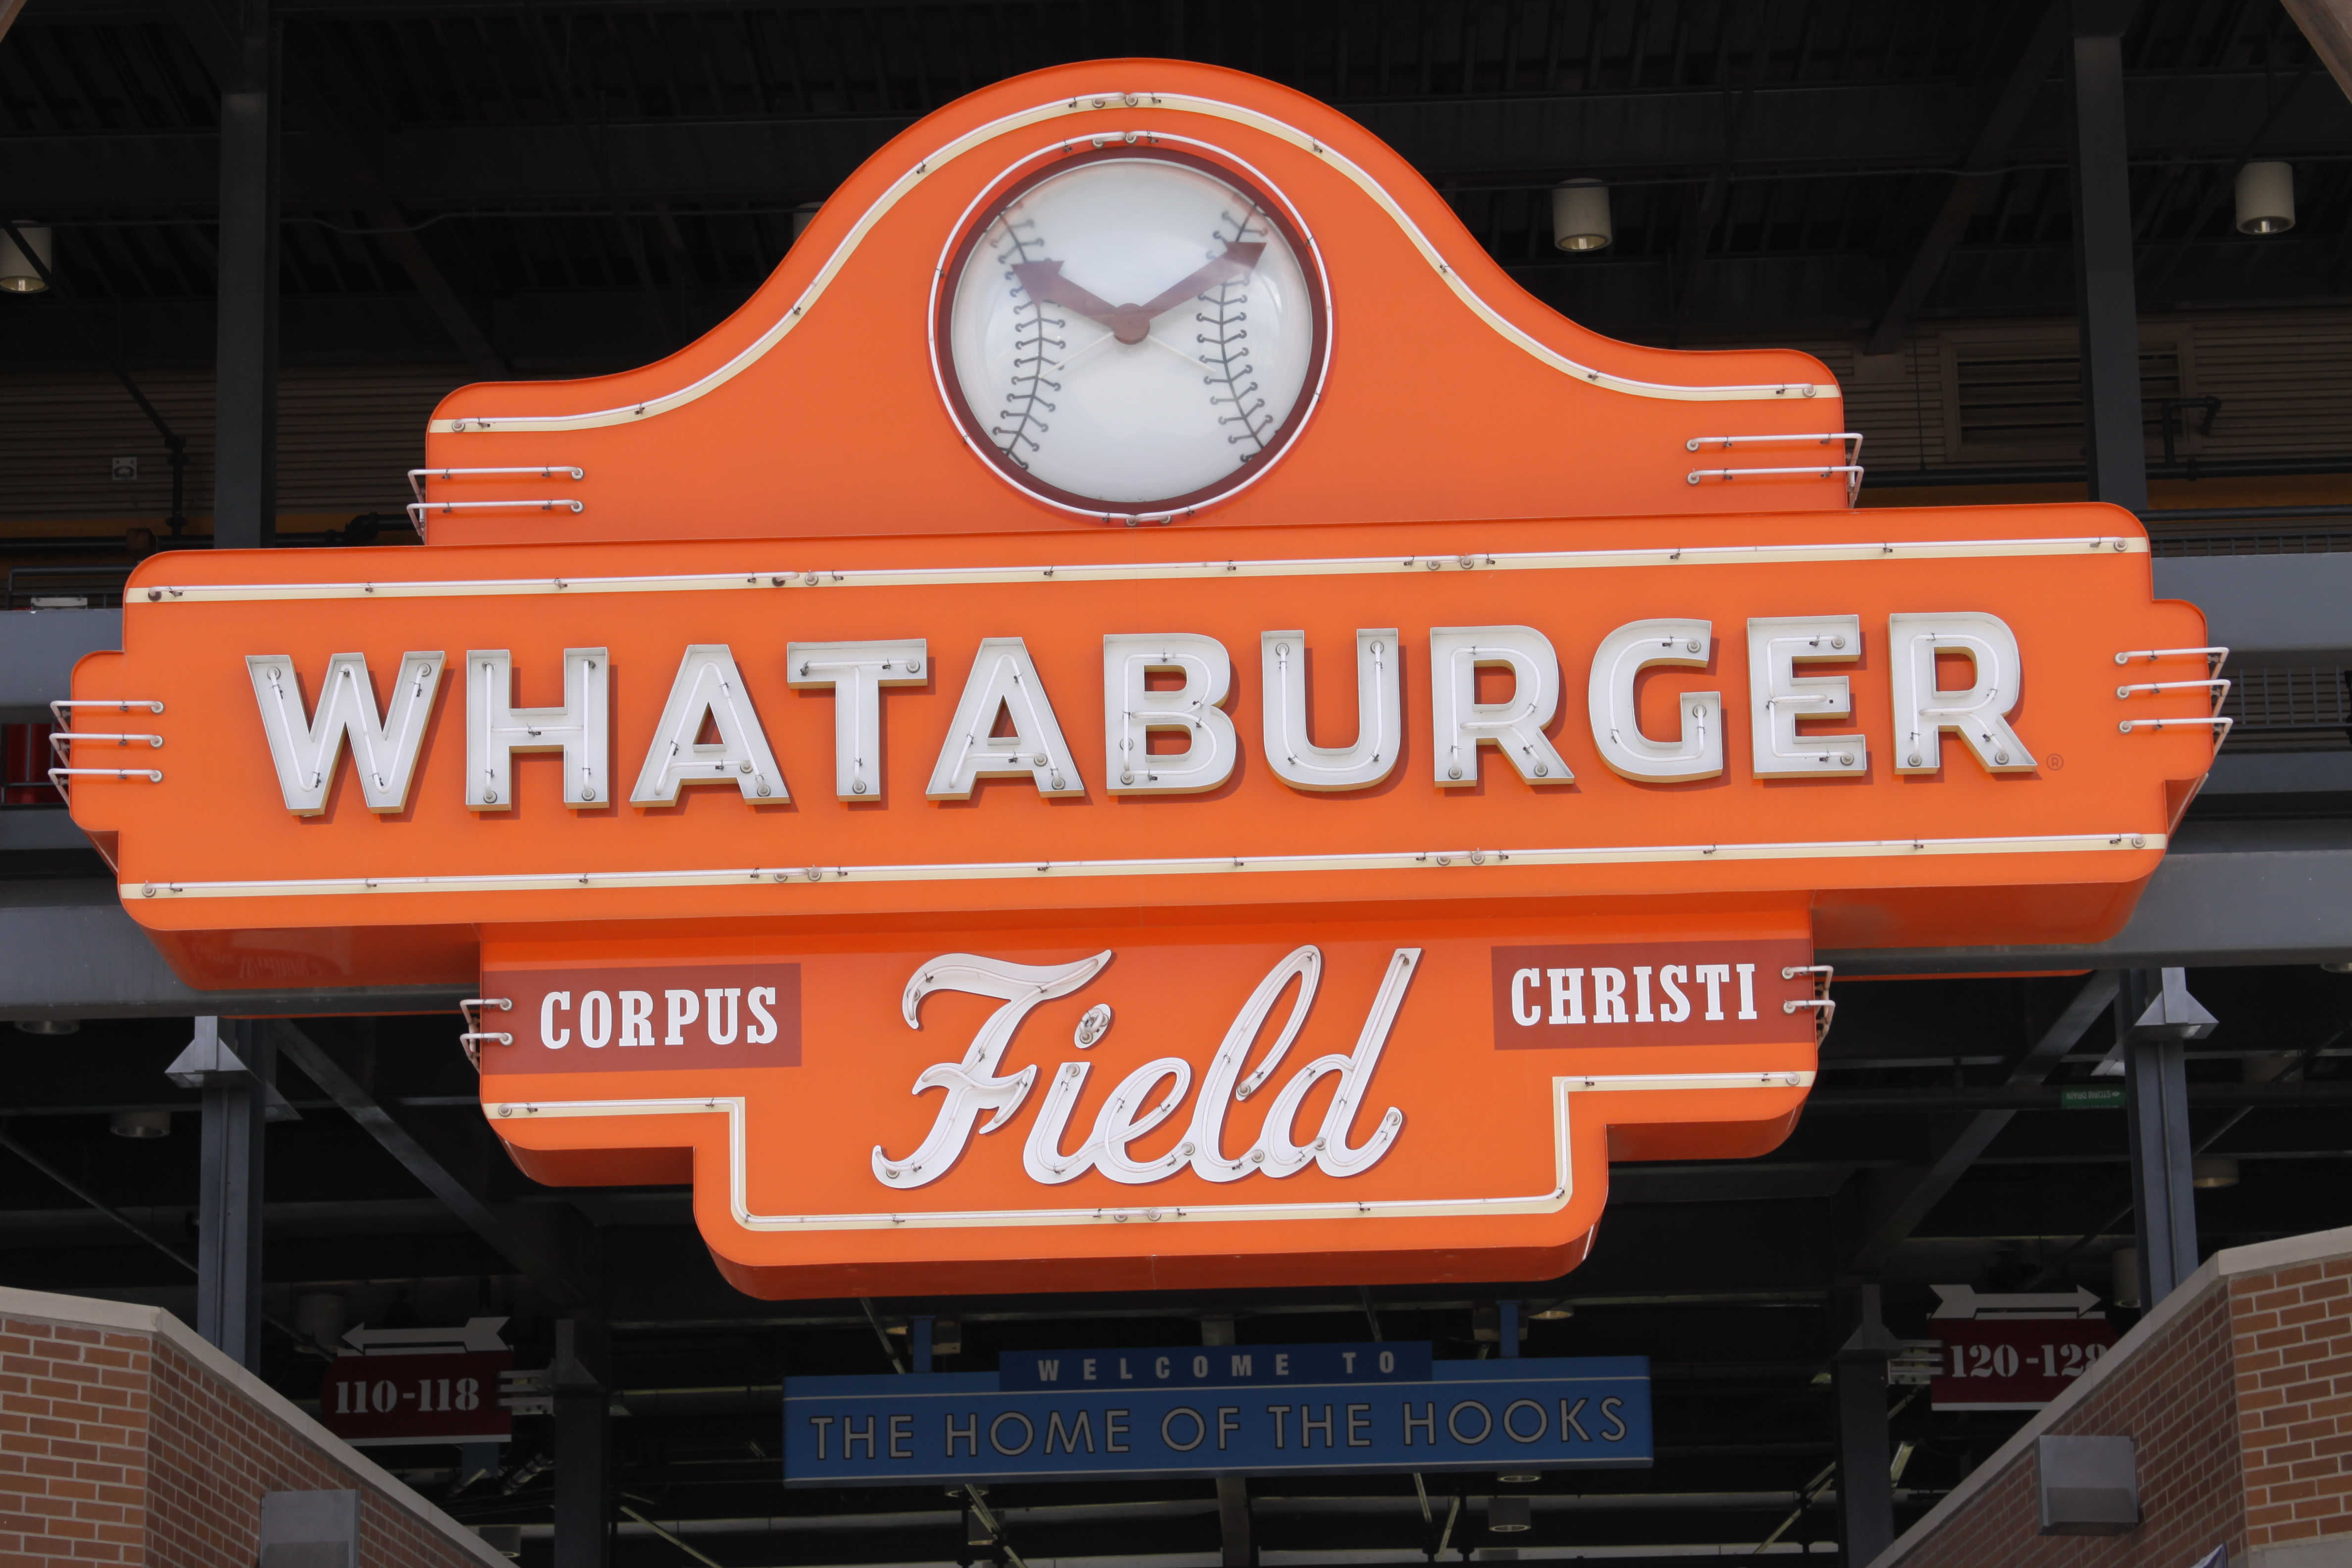 Whataburger_Field_Sign_Corpus_Christi_Texas.jpg